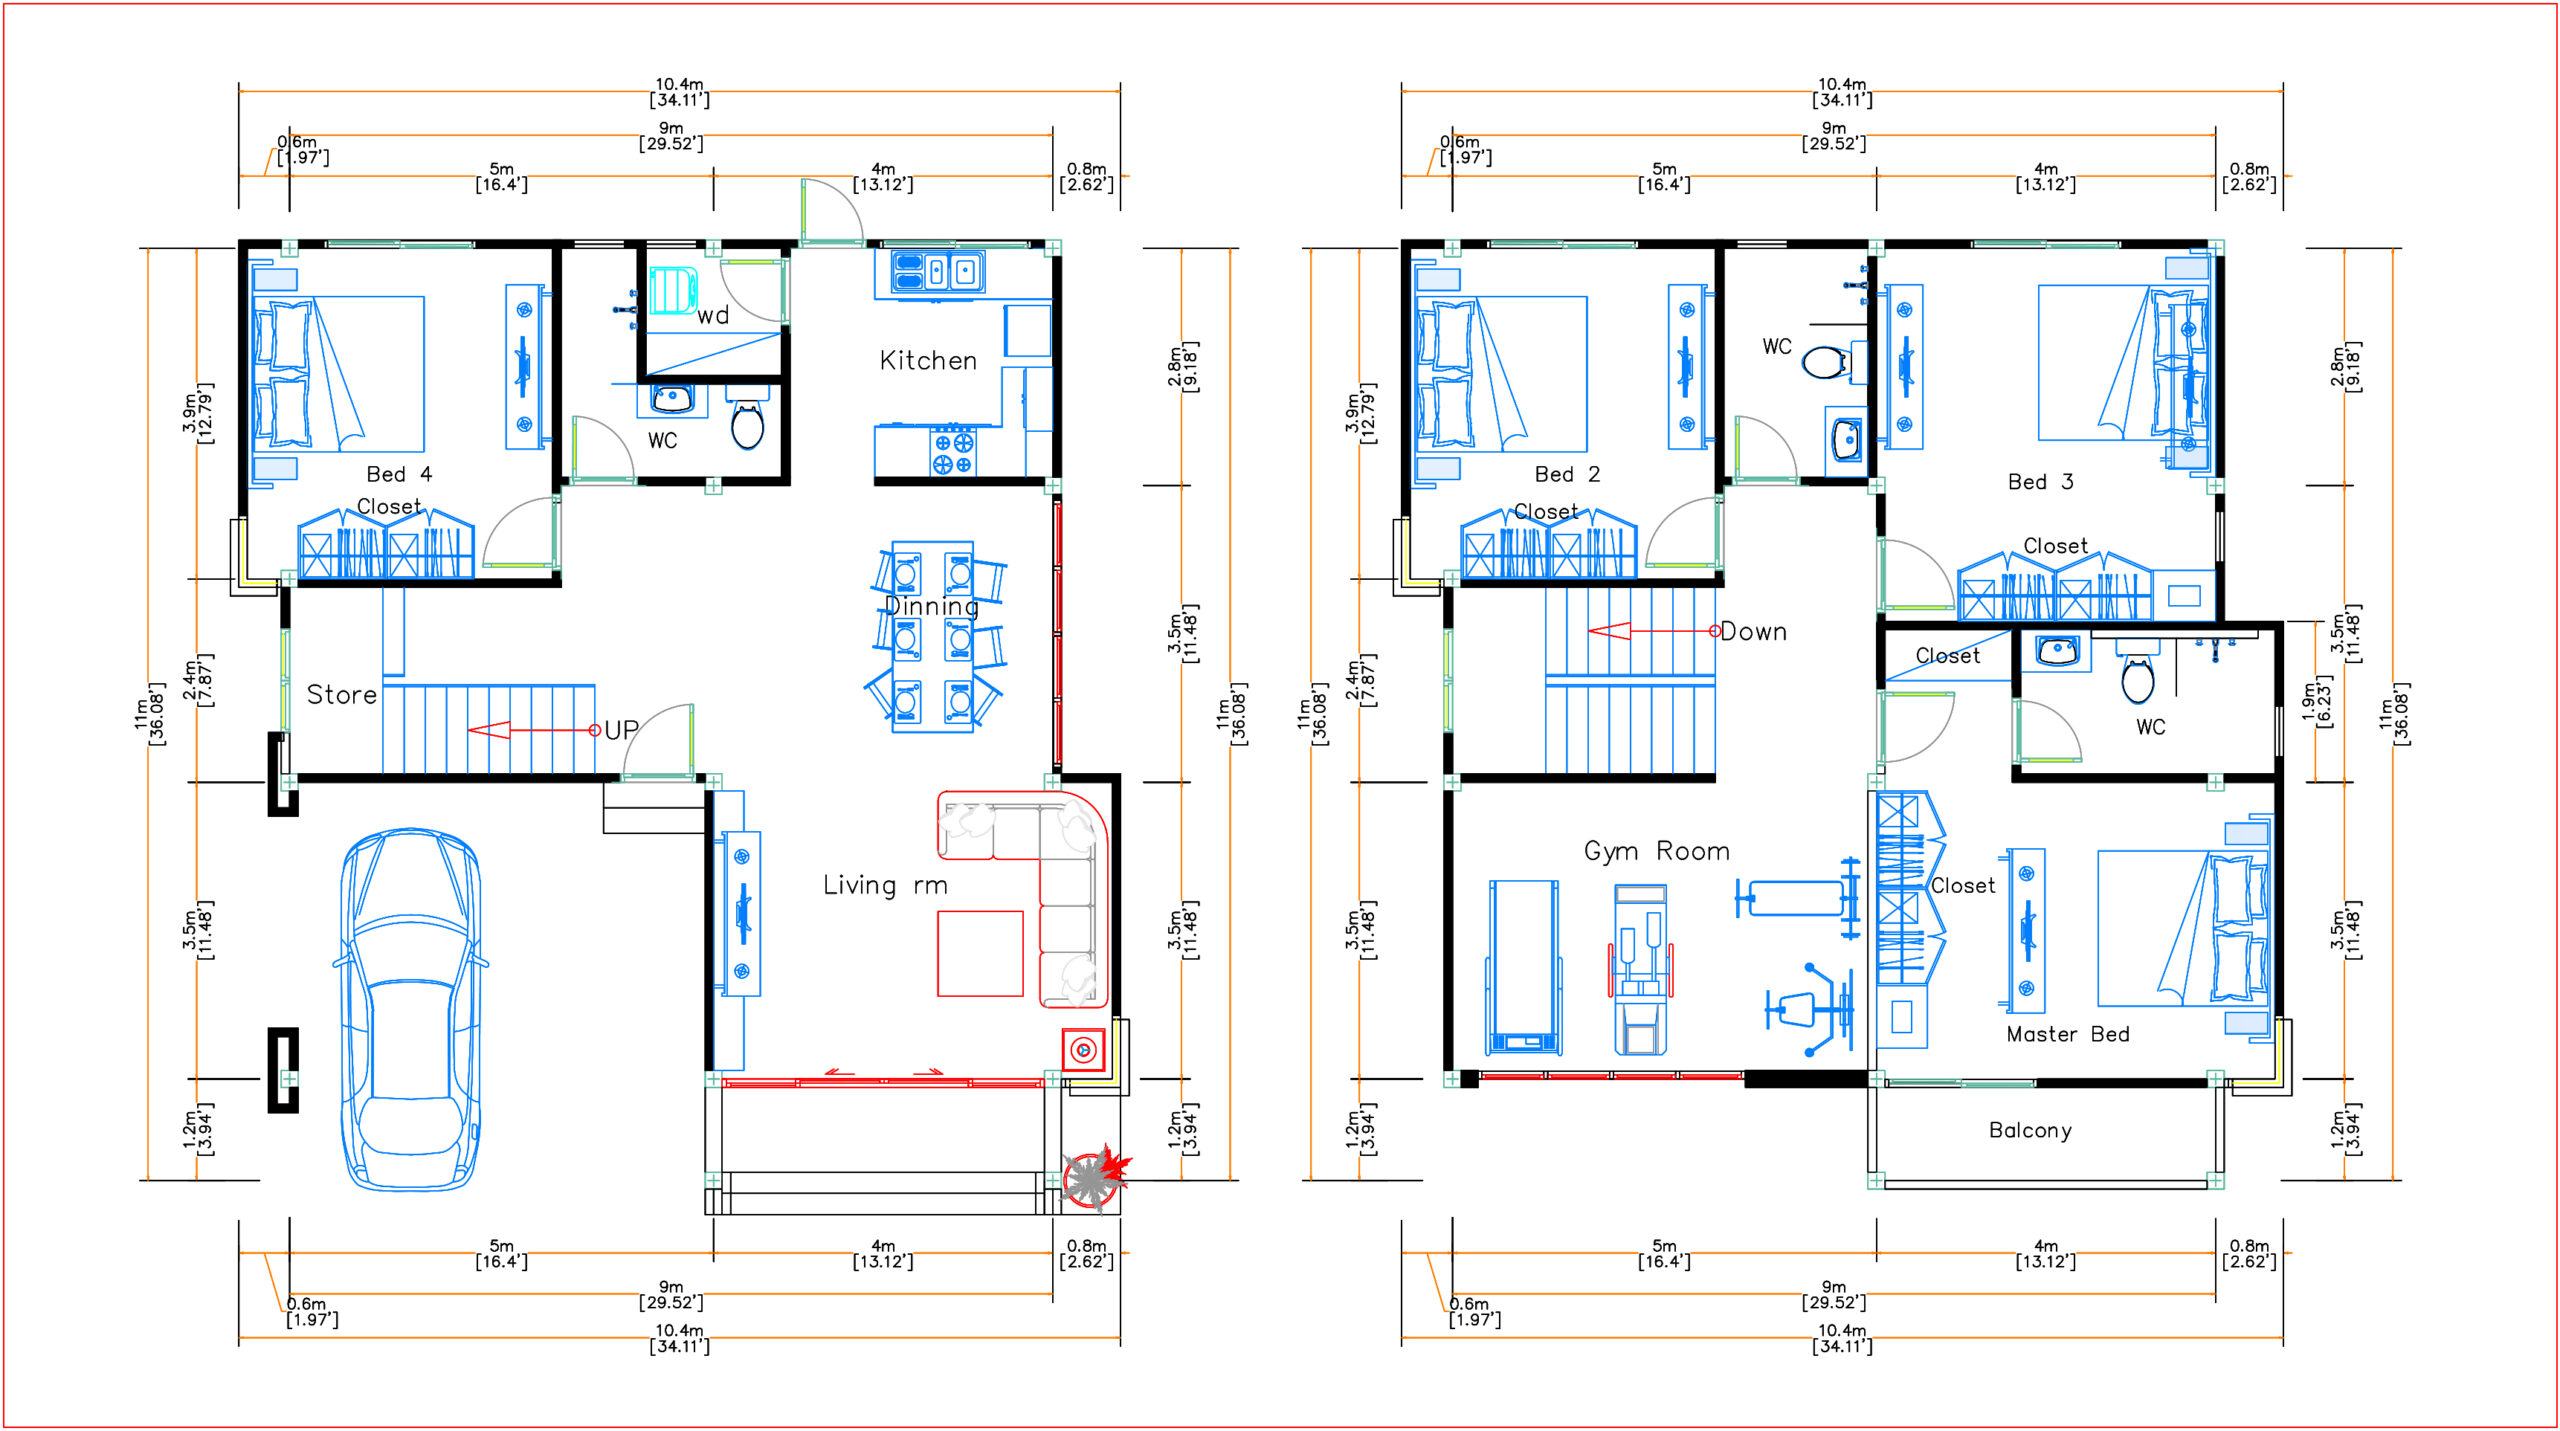 House Plans 9x11 Meter 30x36 Feet 4 Beds Layout floor plan